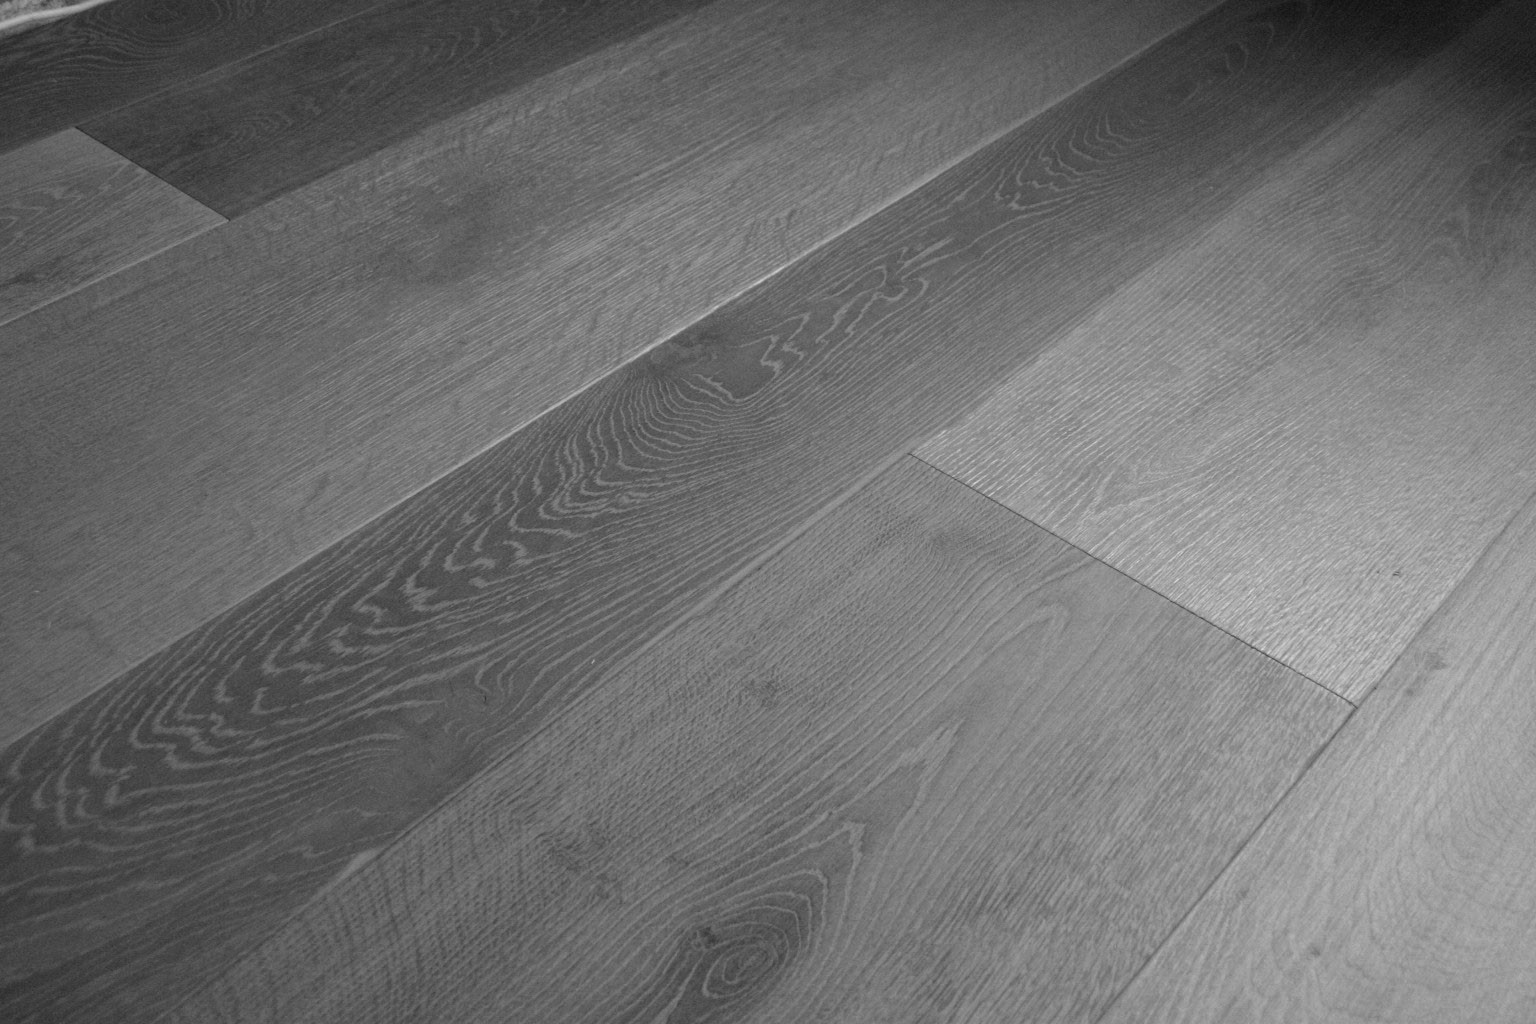 timberclick hardwood flooring reviews of hardwood flooring hardwood floors wooden floors for parallax layer